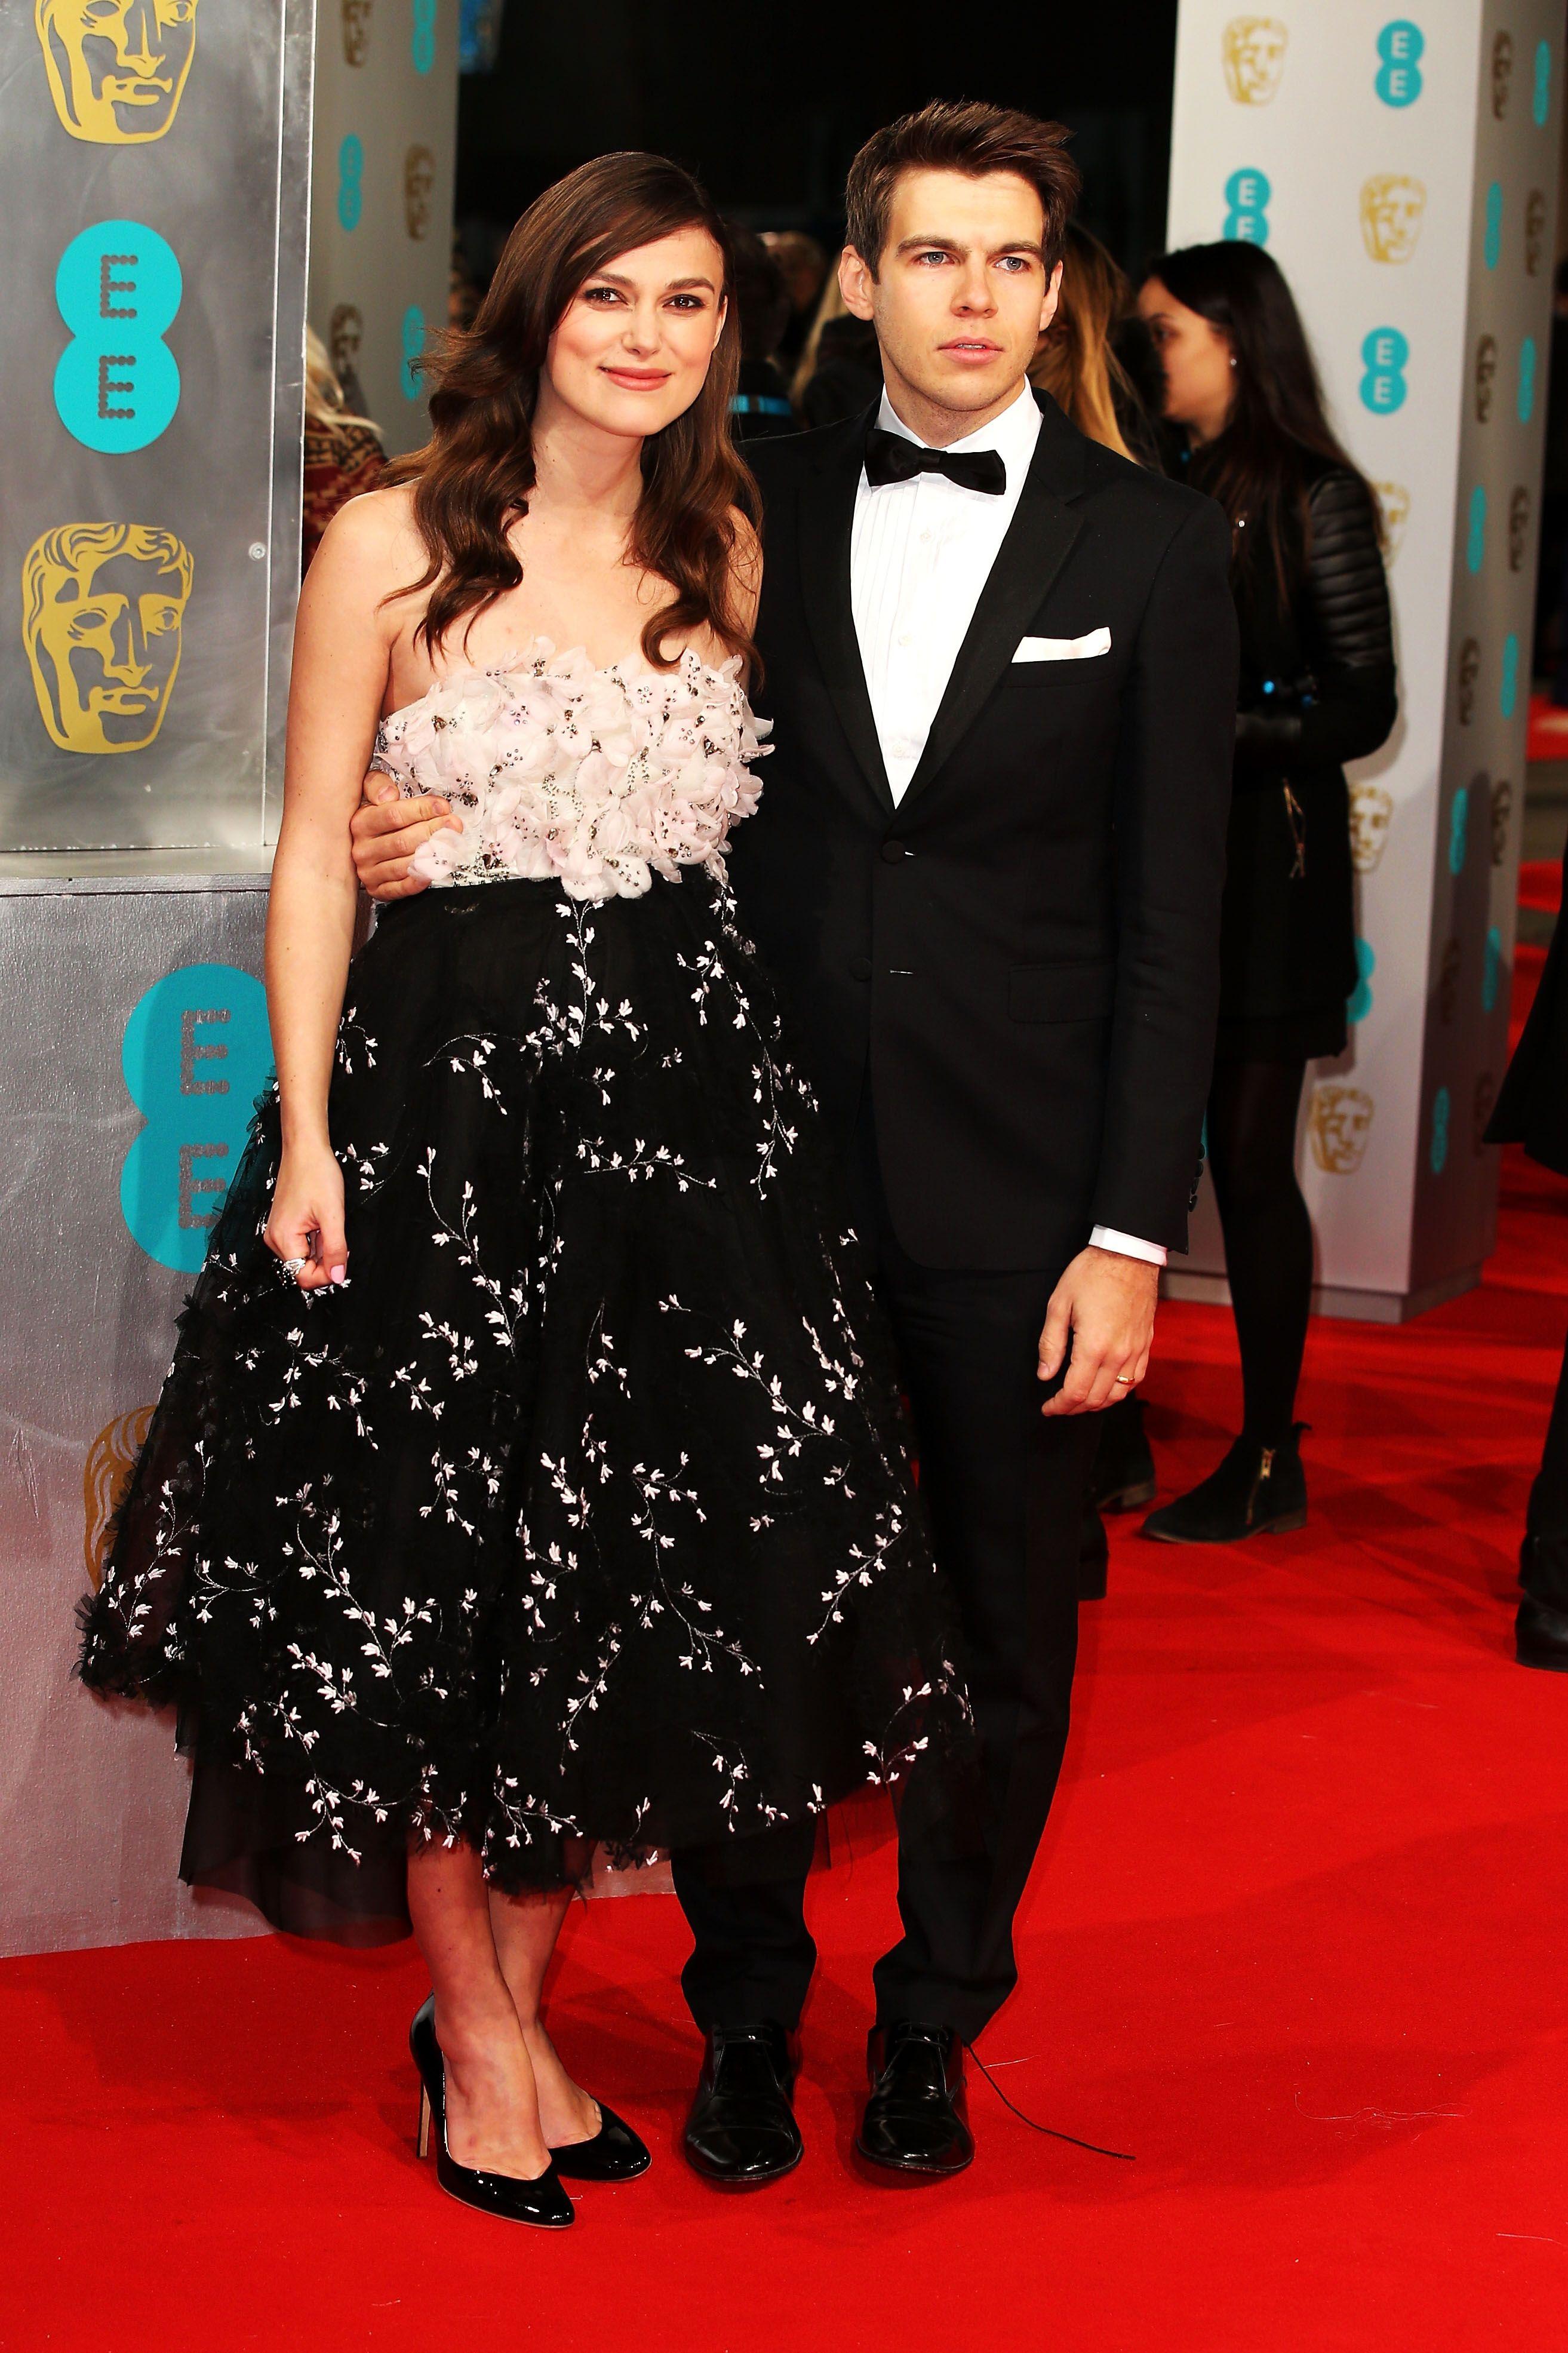 BAFTAs 2015 red carpet | Harper's Bazaar